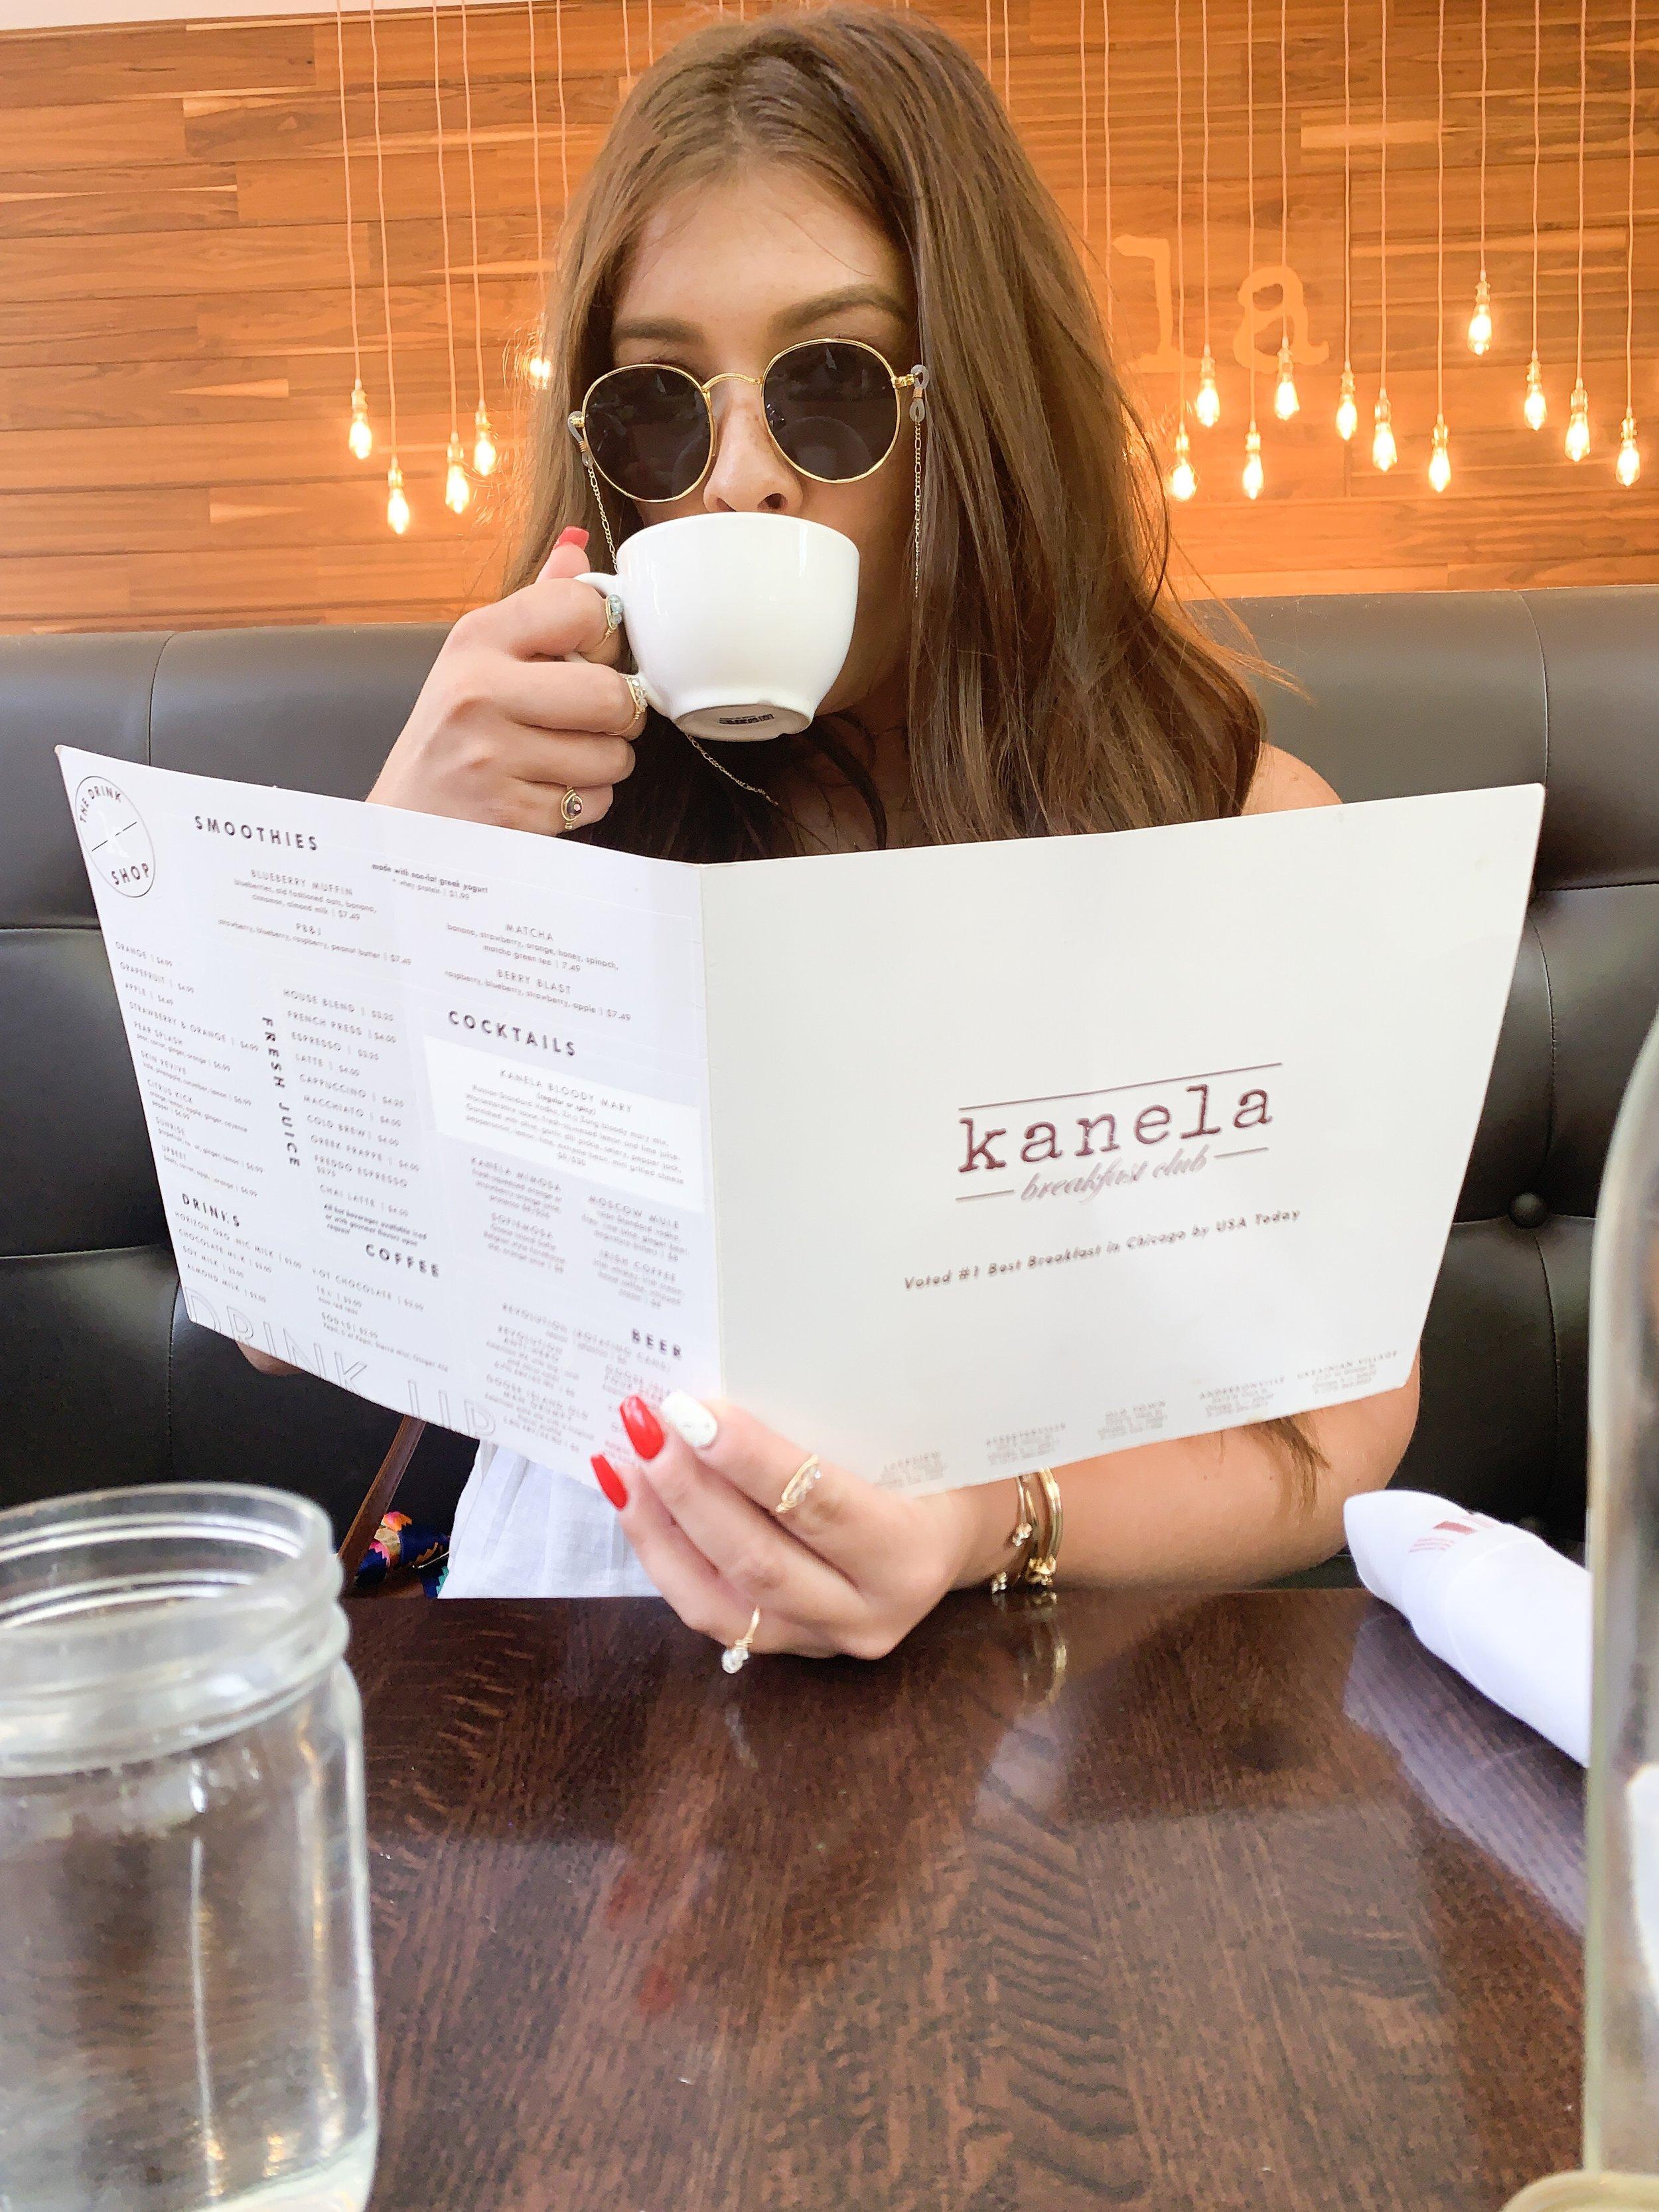 Kanela Breakfast Club